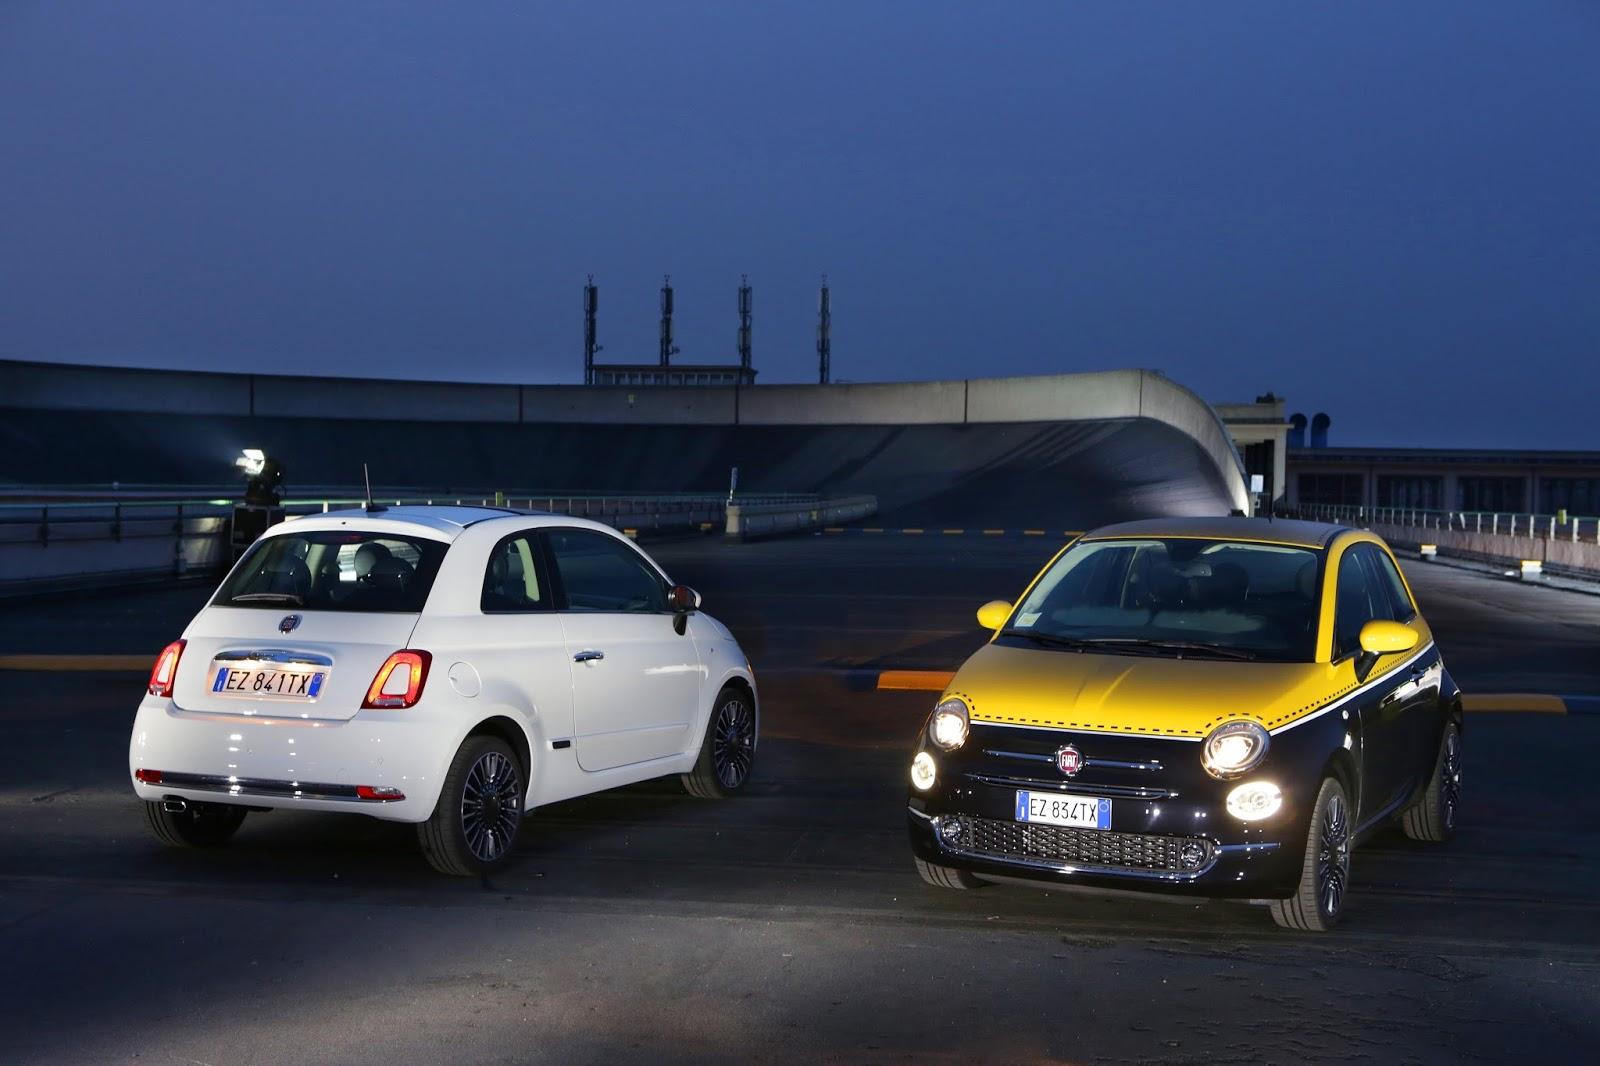 150704 Fiat Nuova 500 Η άφιξη του νέου Fiat 500 είναι γεγονός